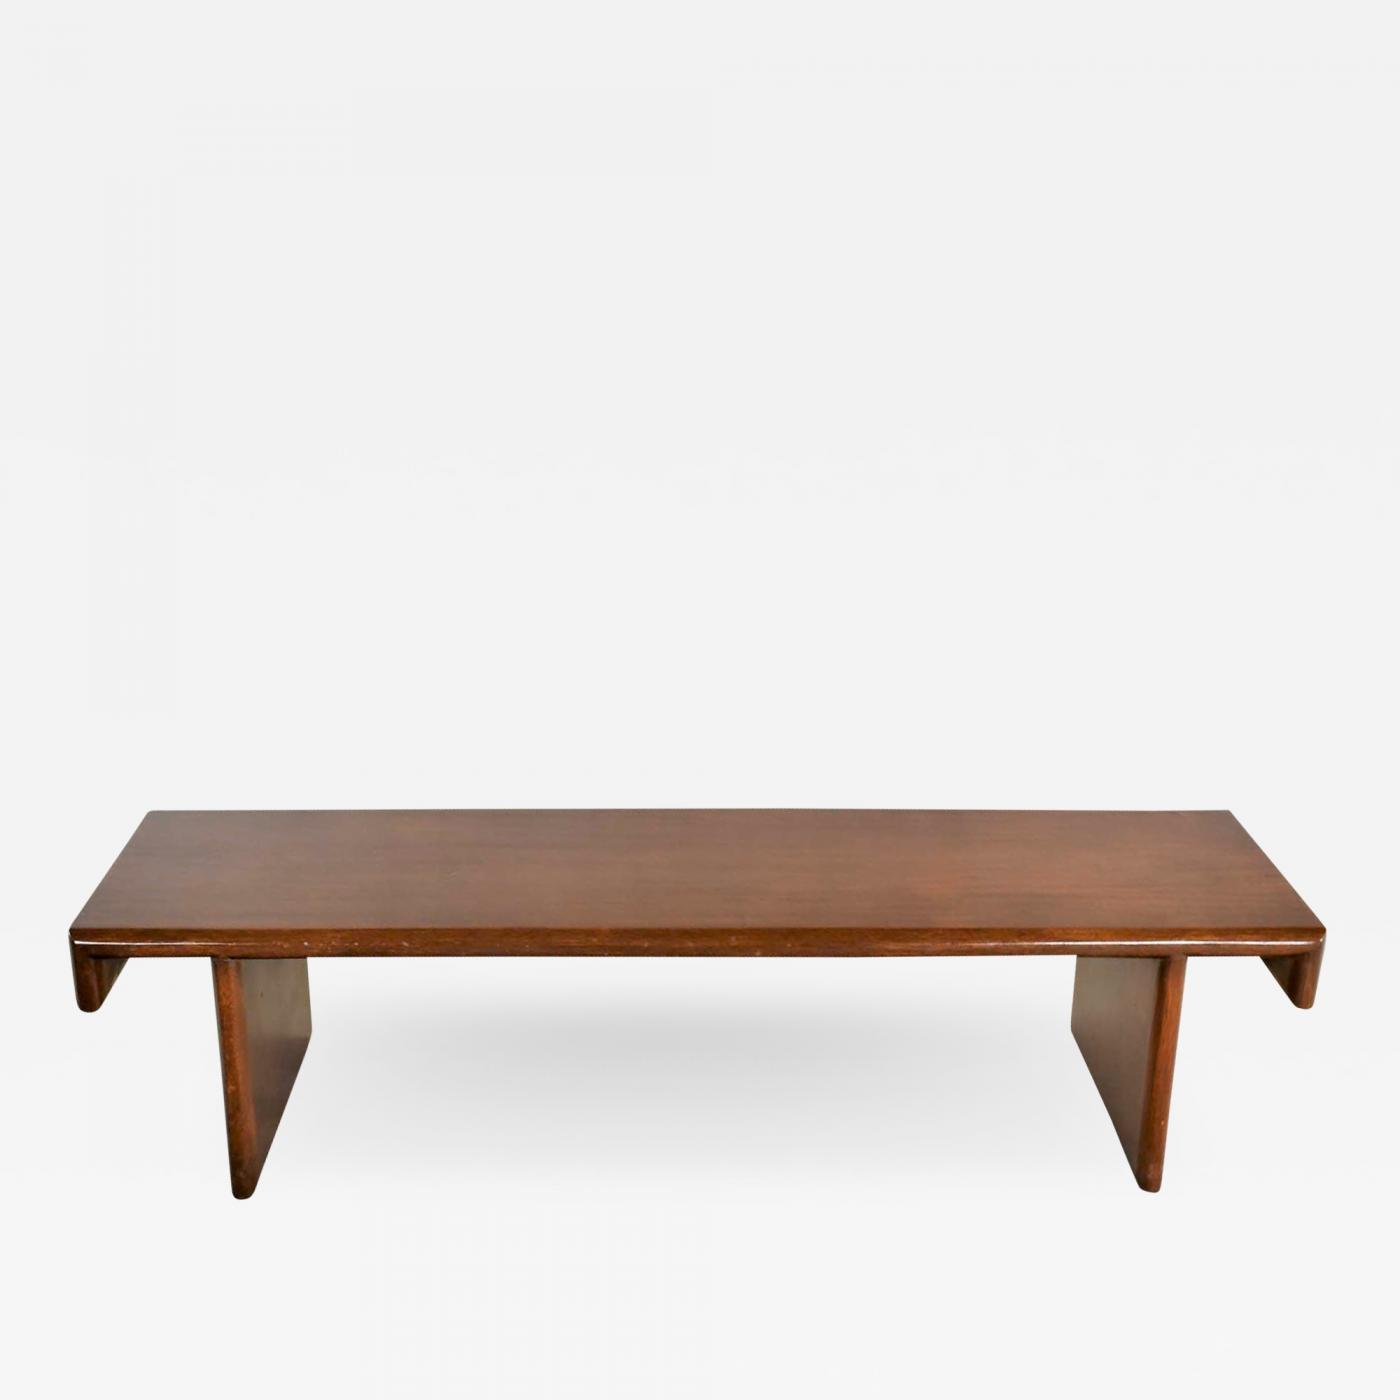 Frank Lloyd Wright Vintage Walnut Stained Mahogany Bench Coffee Table Style Of Frank Lloyd Wright